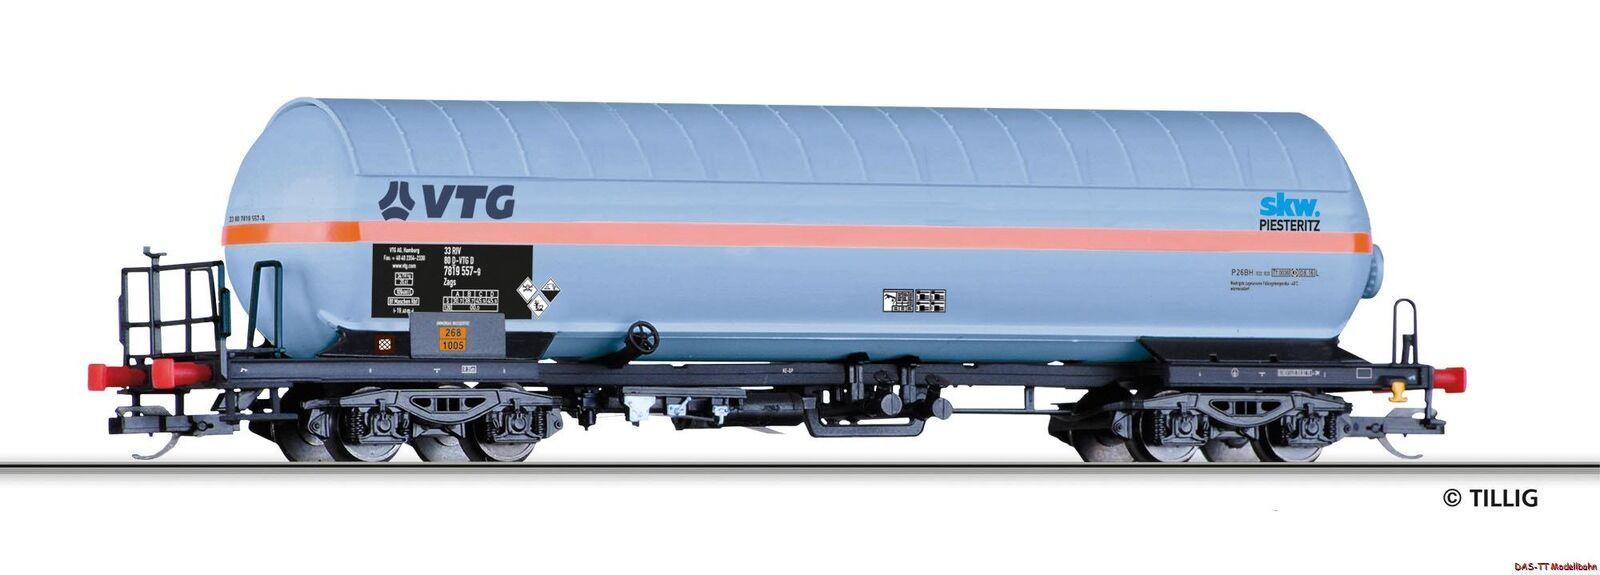 TT gaskessel carrello VTG/SKW Pisteritz CON PARASOLE TETTO EP. vi Tillig 15035